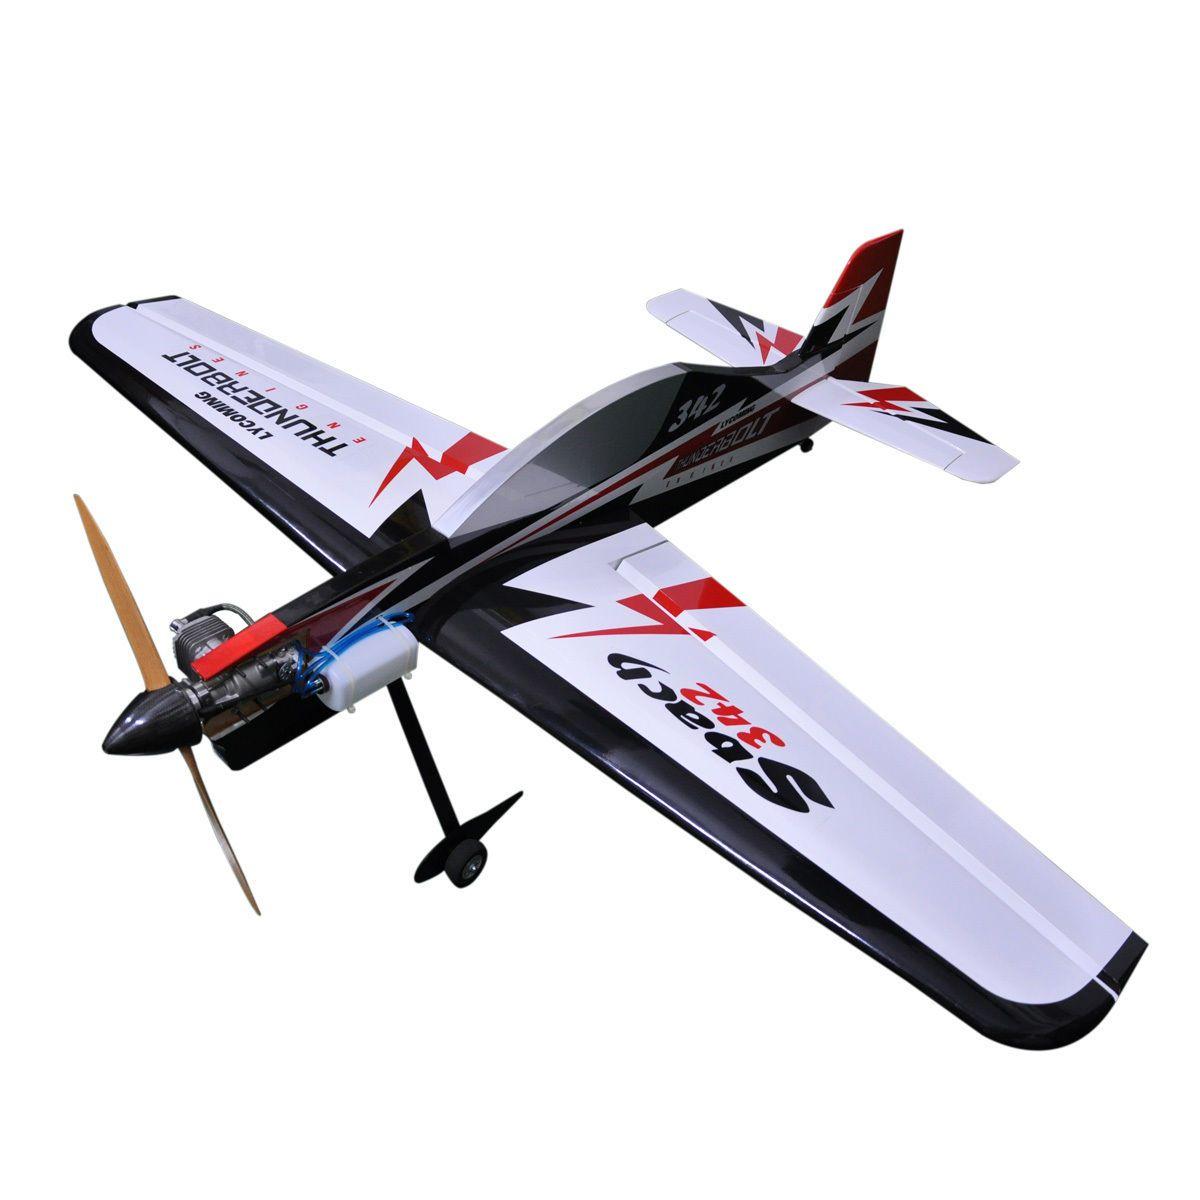 Details about 3D Aerobatic Flight Model Gas 20cc RC airplane